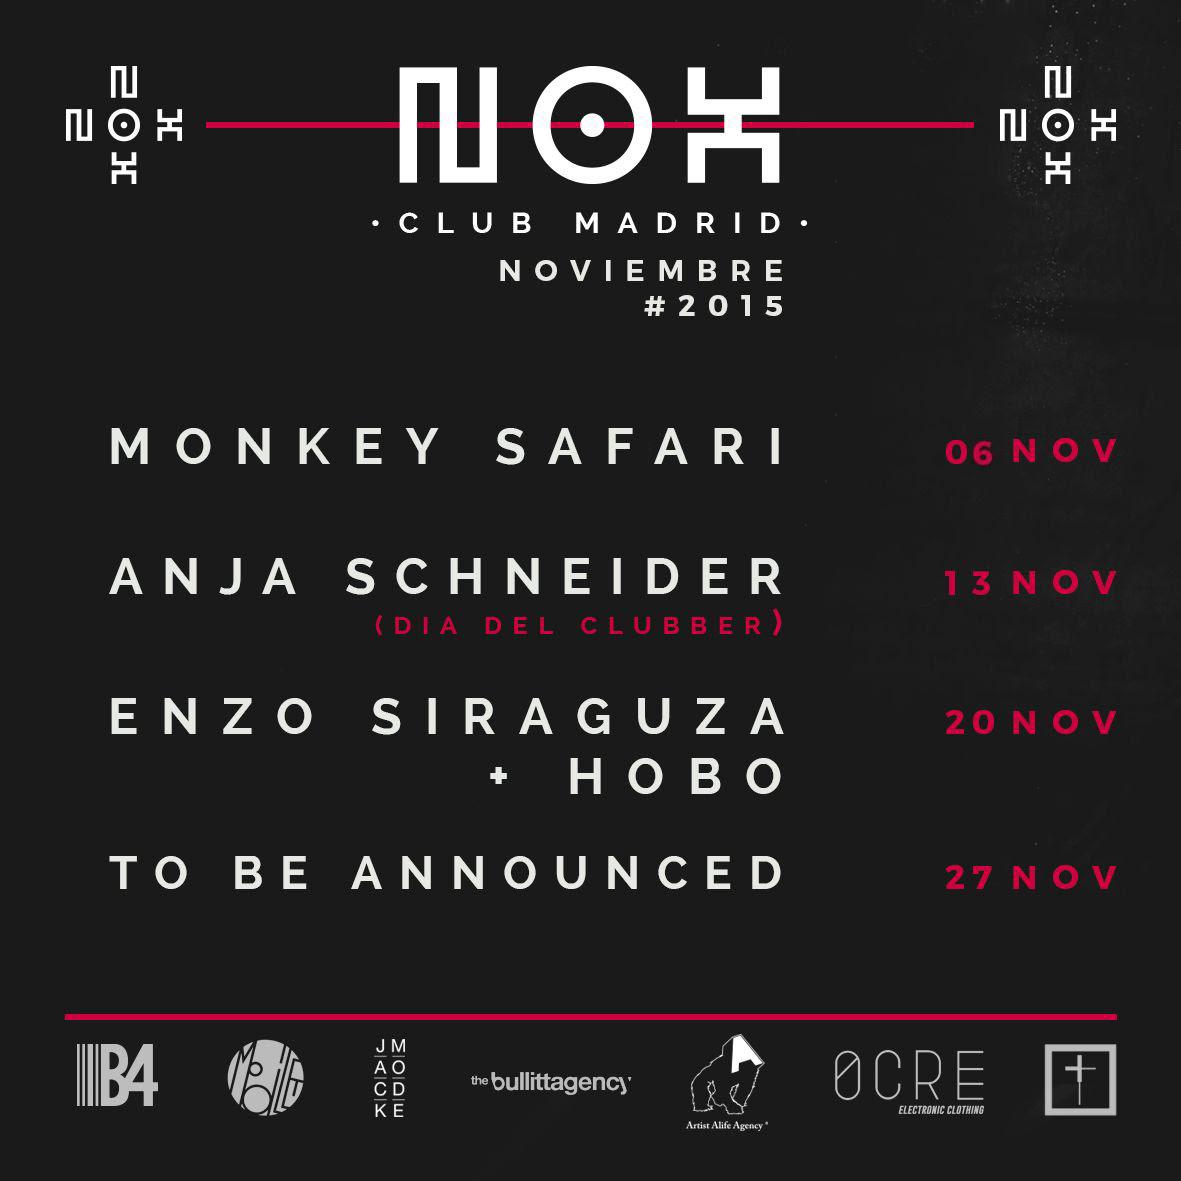 bd2ba906-b7ac-4897-99ae-b1fb76bb83f4 NOX Club Madrid, agenda noviembre